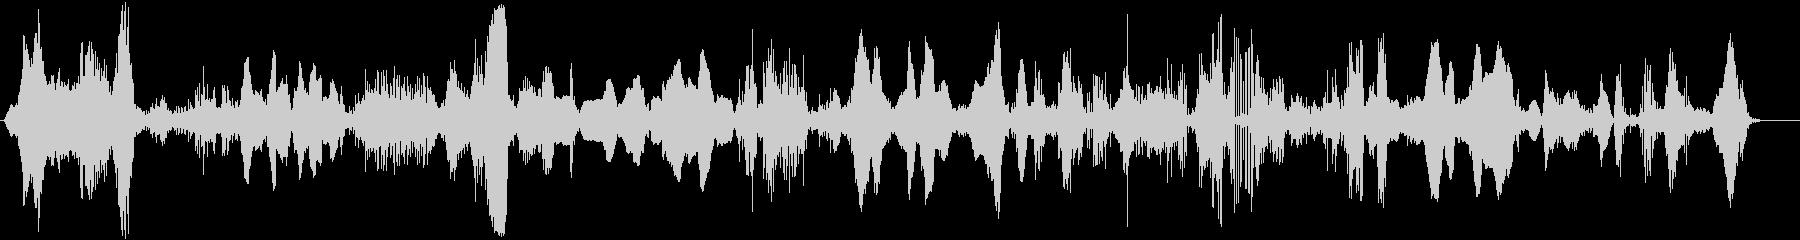 AGGRAVATED VOCALク...の未再生の波形